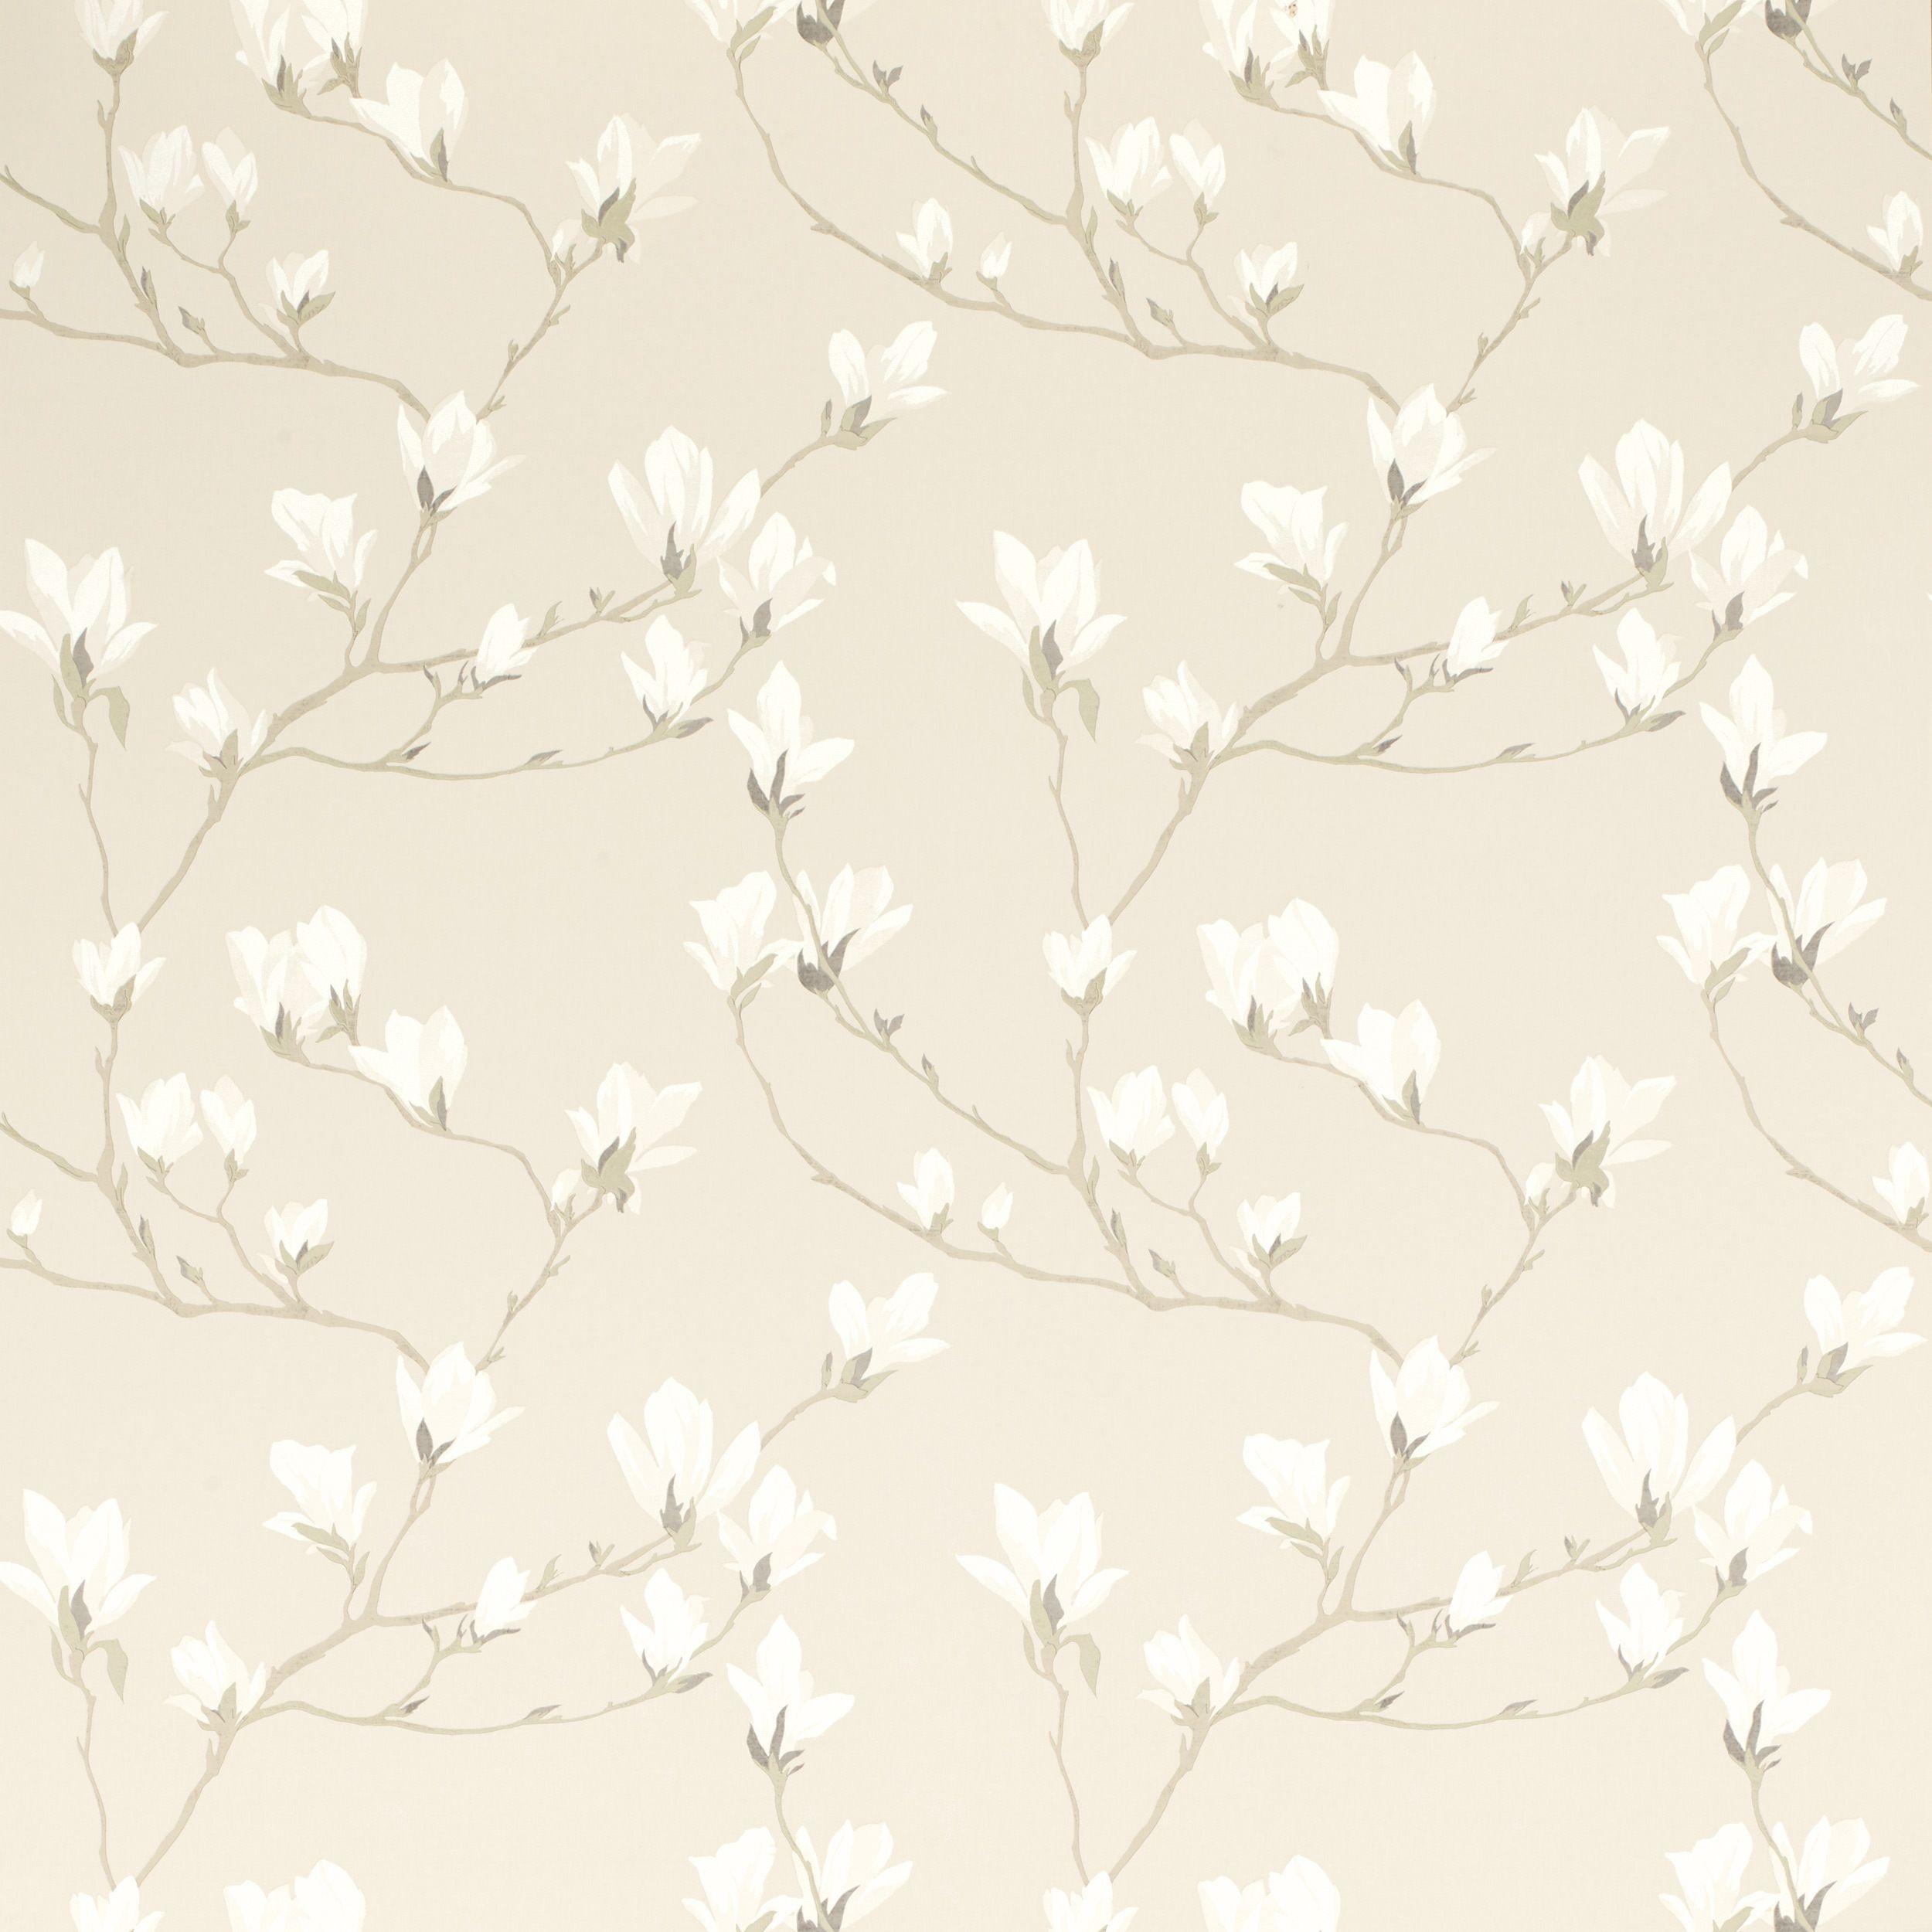 Magnolia Grove Natural Wallpaper at Laura Ashley Bedroom